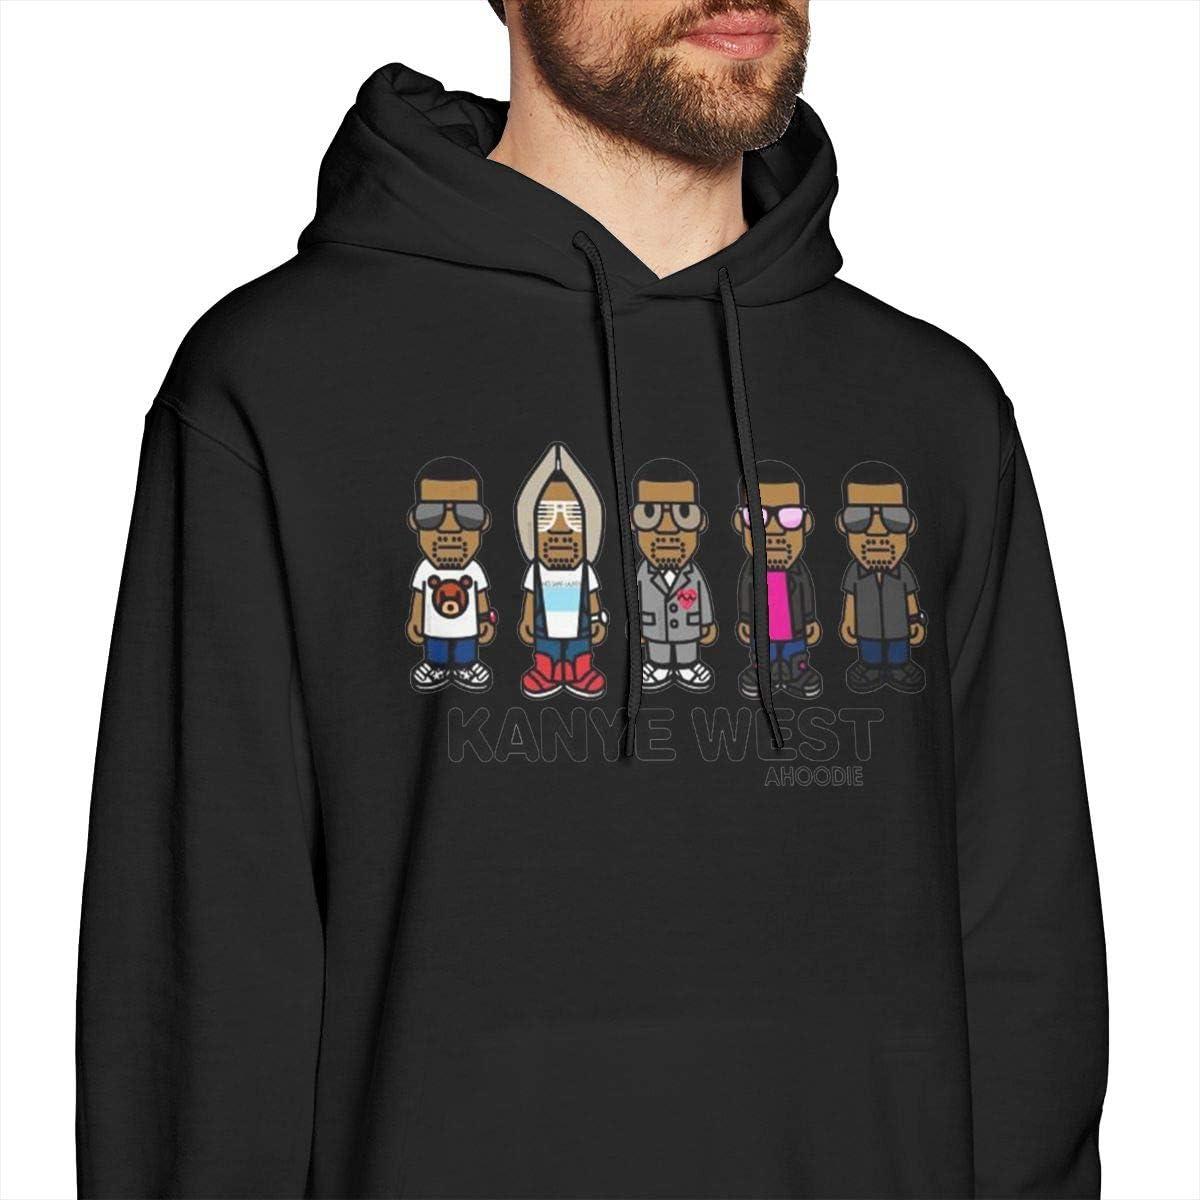 Mens Hooded Sweatshirt Kanye West New Classic Minimalist Style Black